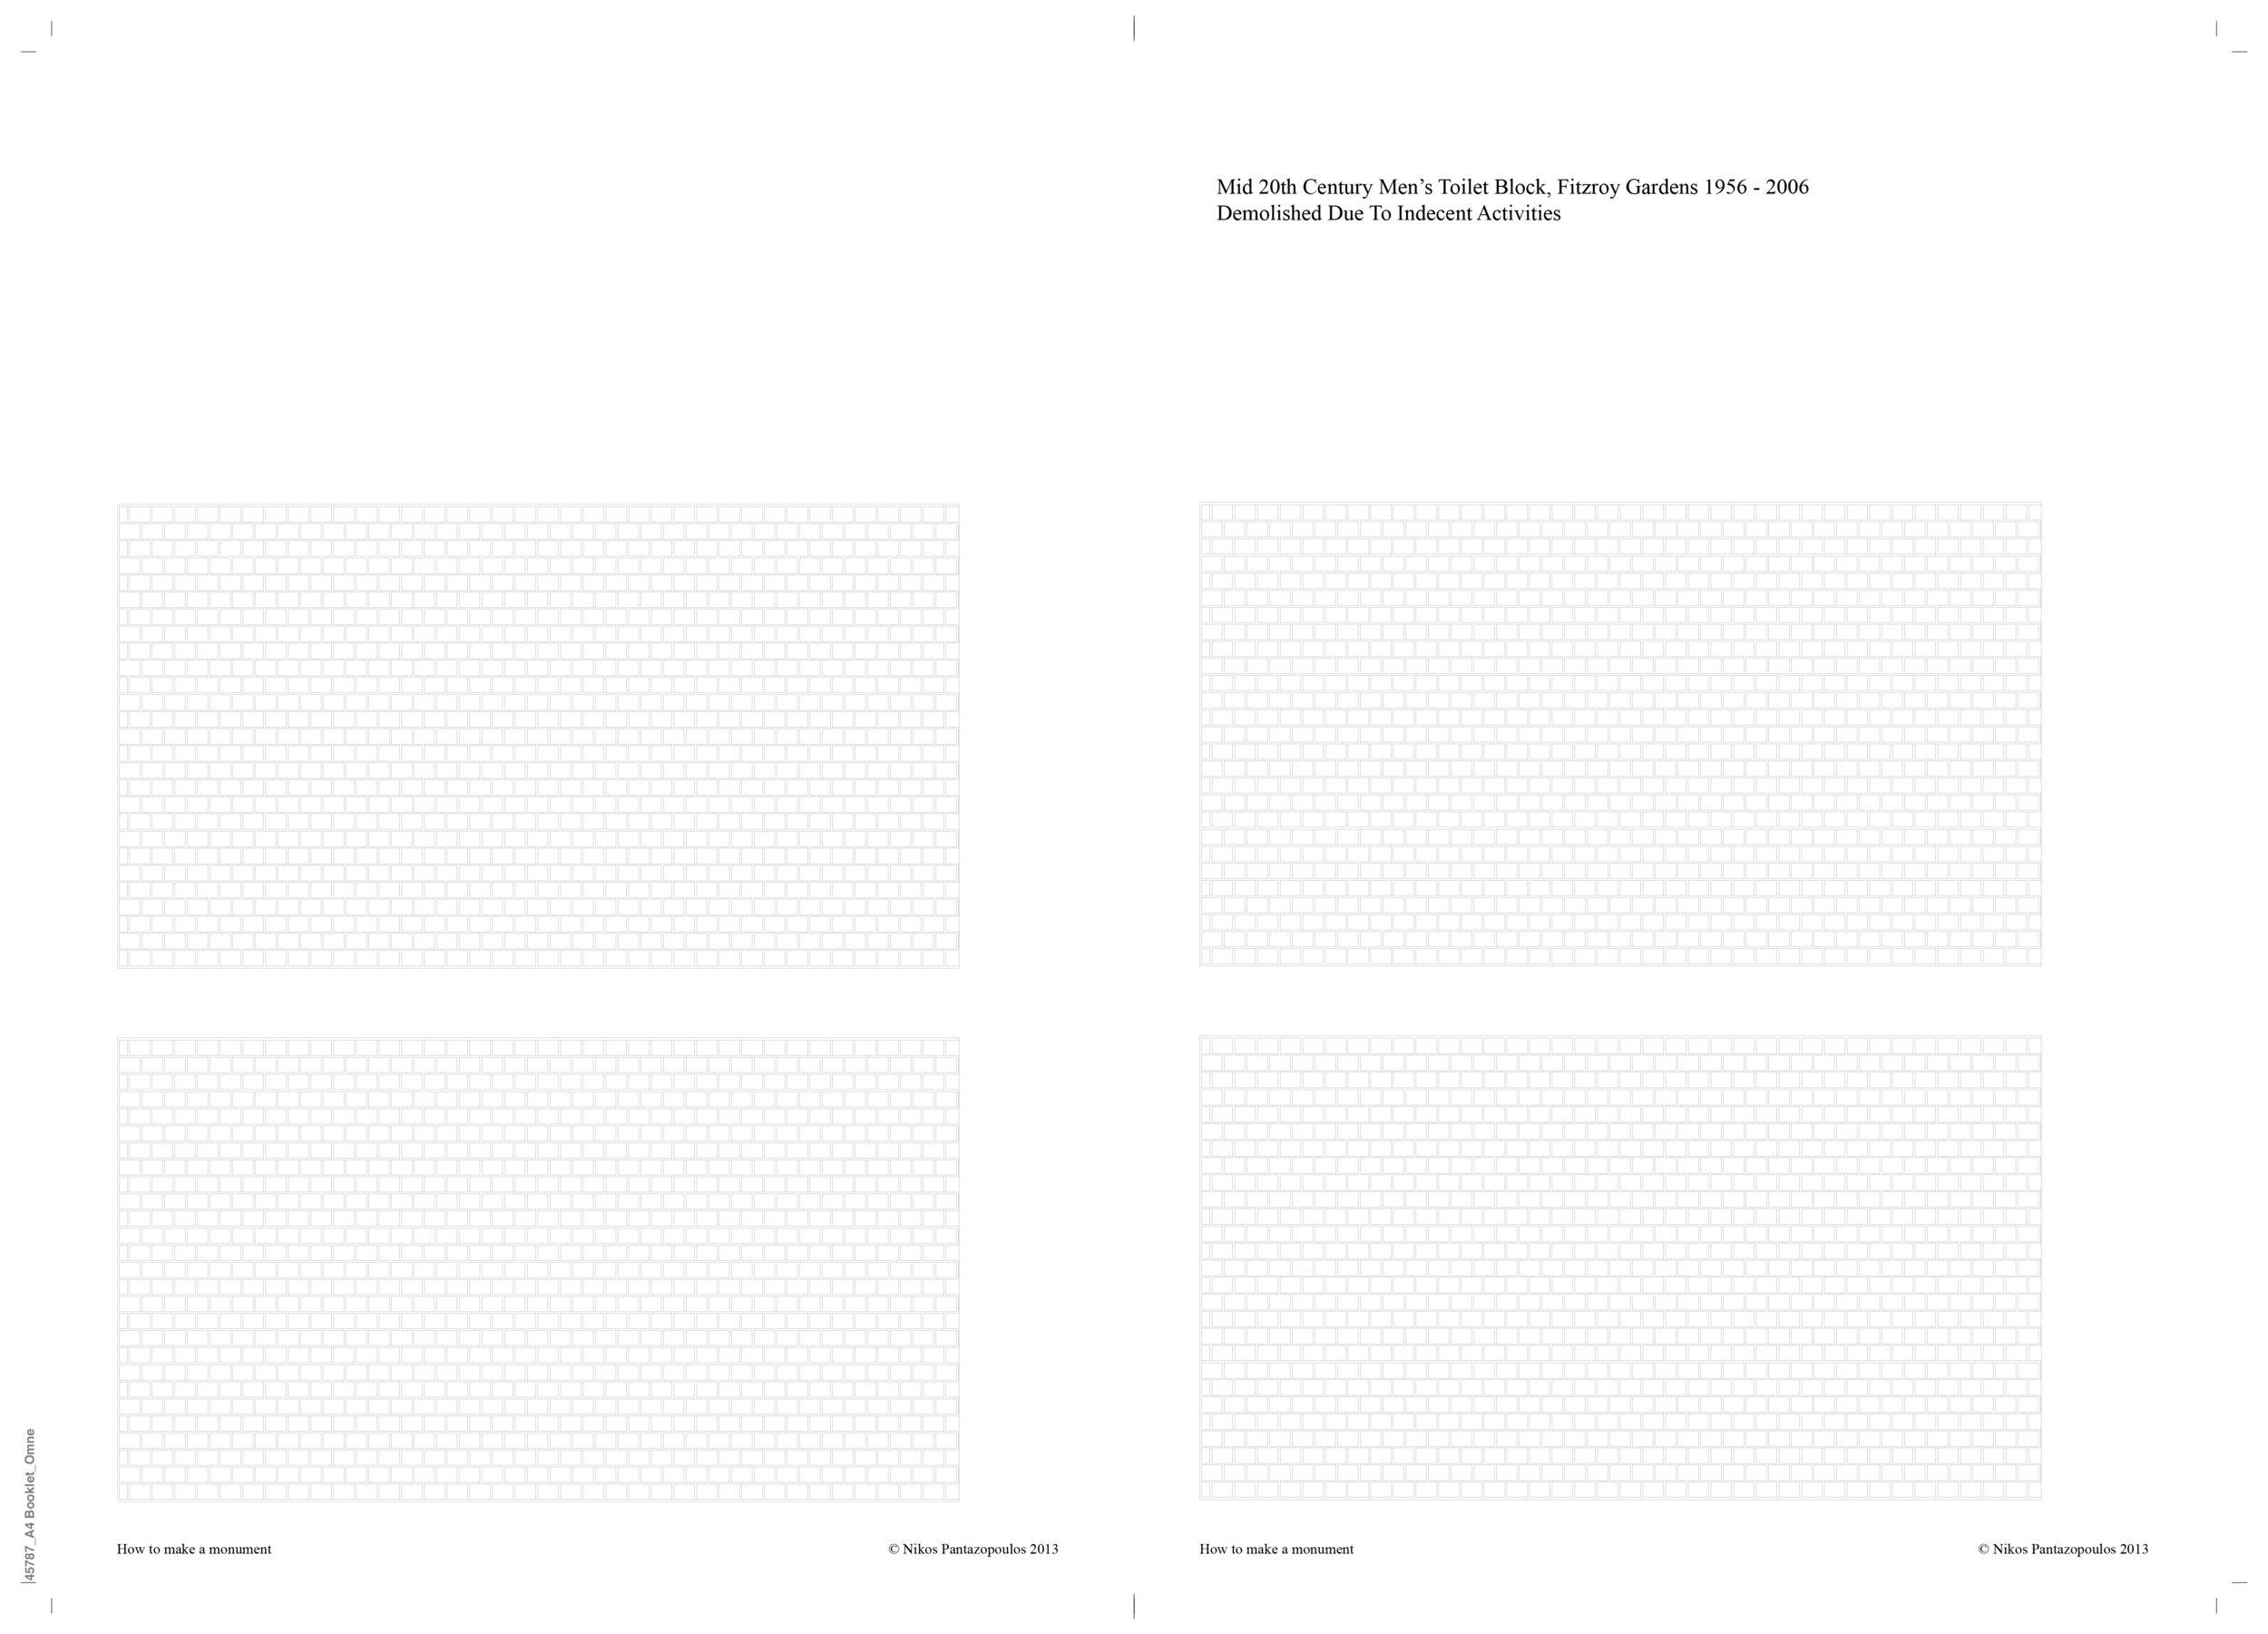 45787_A4 Booklet_Omne-1.jpg